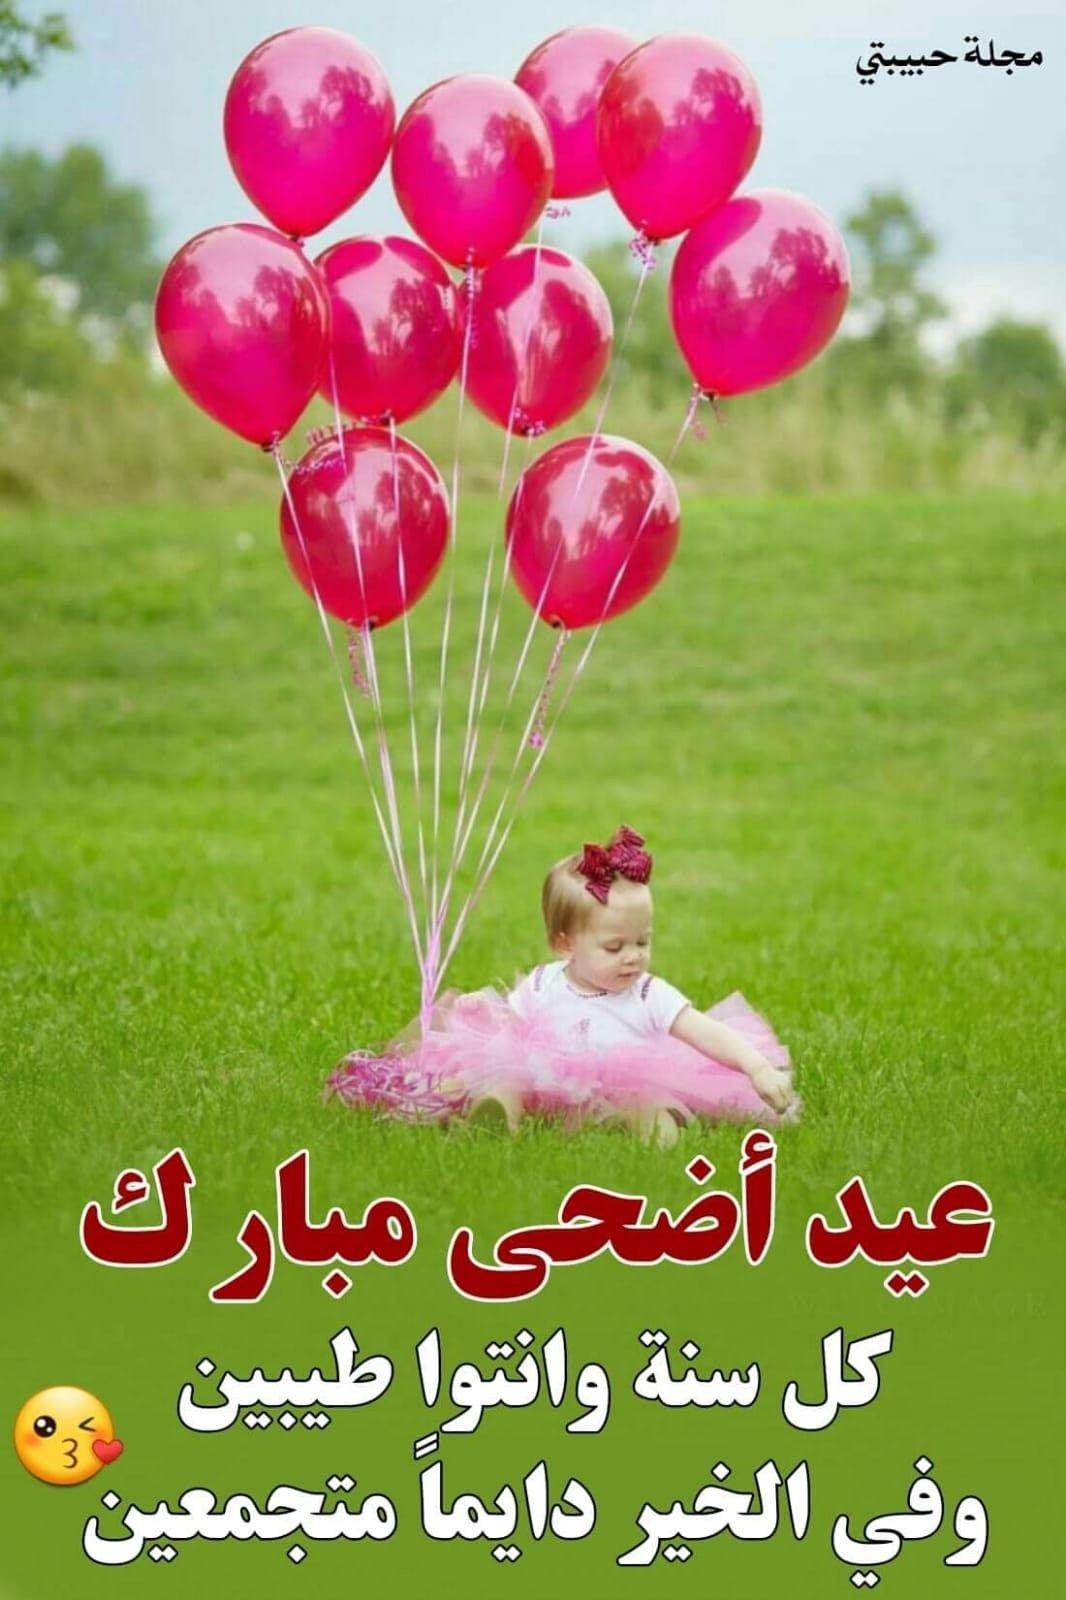 Pin By فلسطينية ولي الفخر On عساكم من عواده Movie Posters Poster Movies